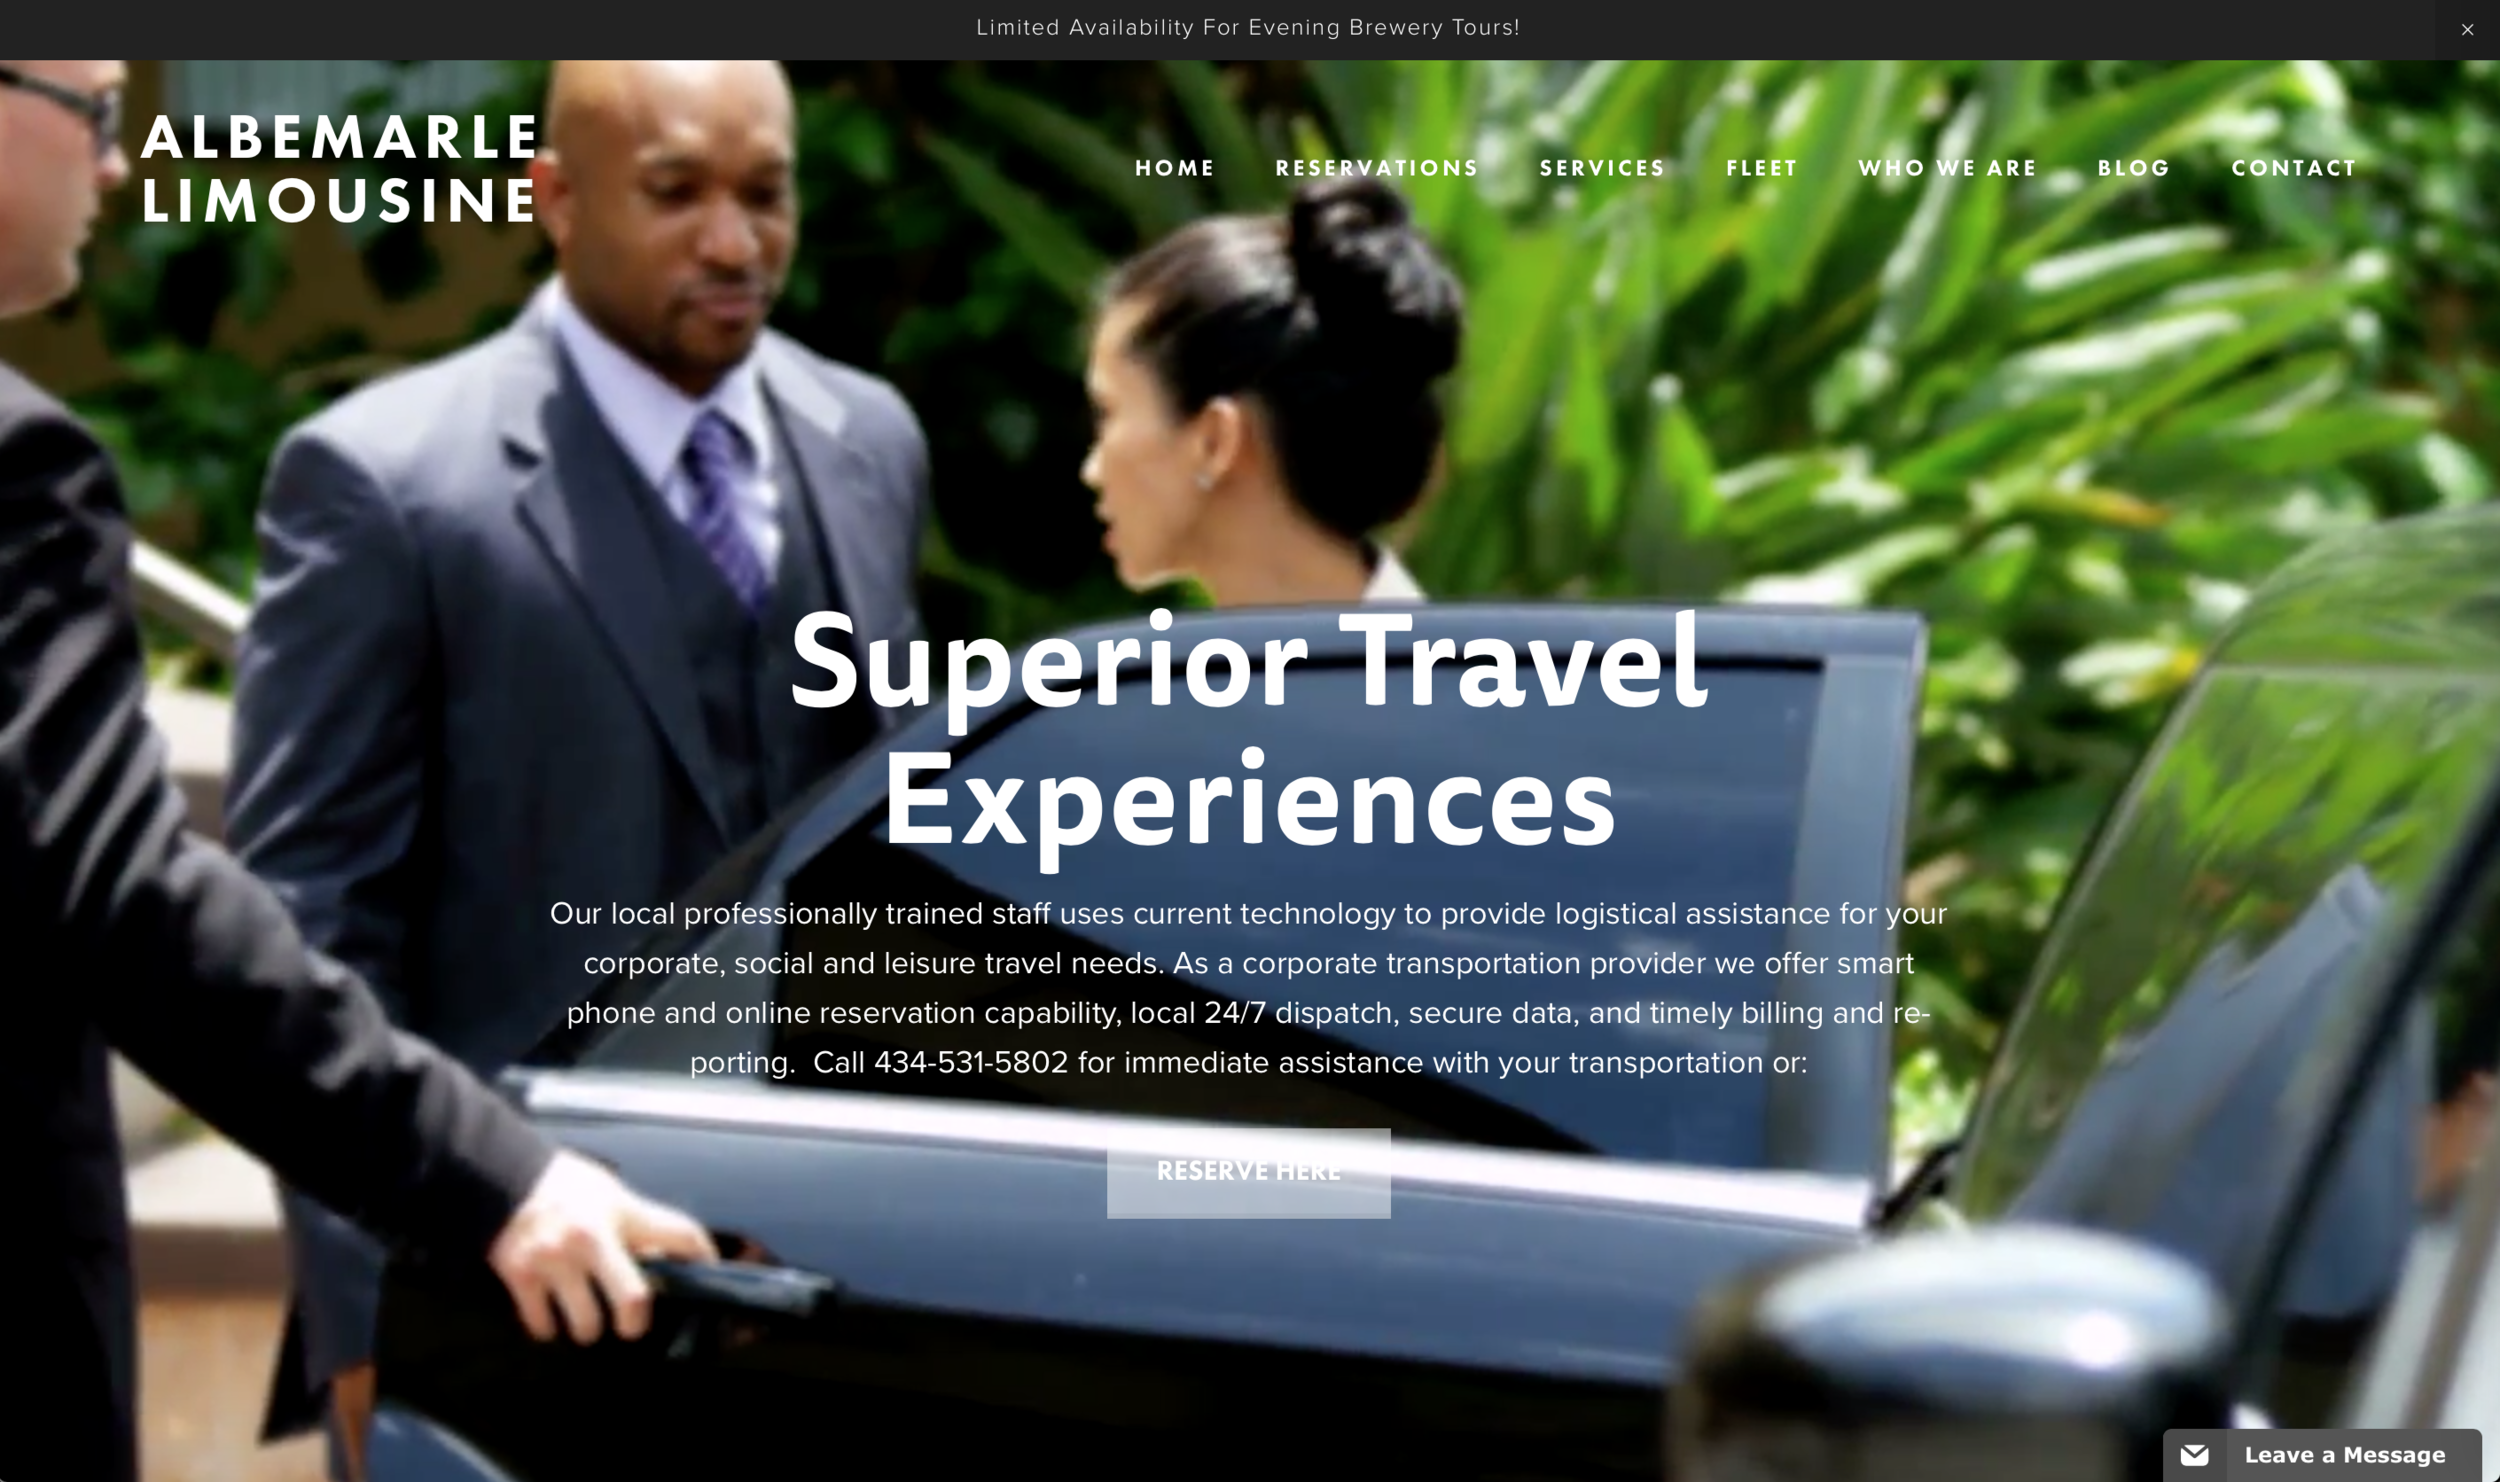 Website Design - Albemarle Limousine